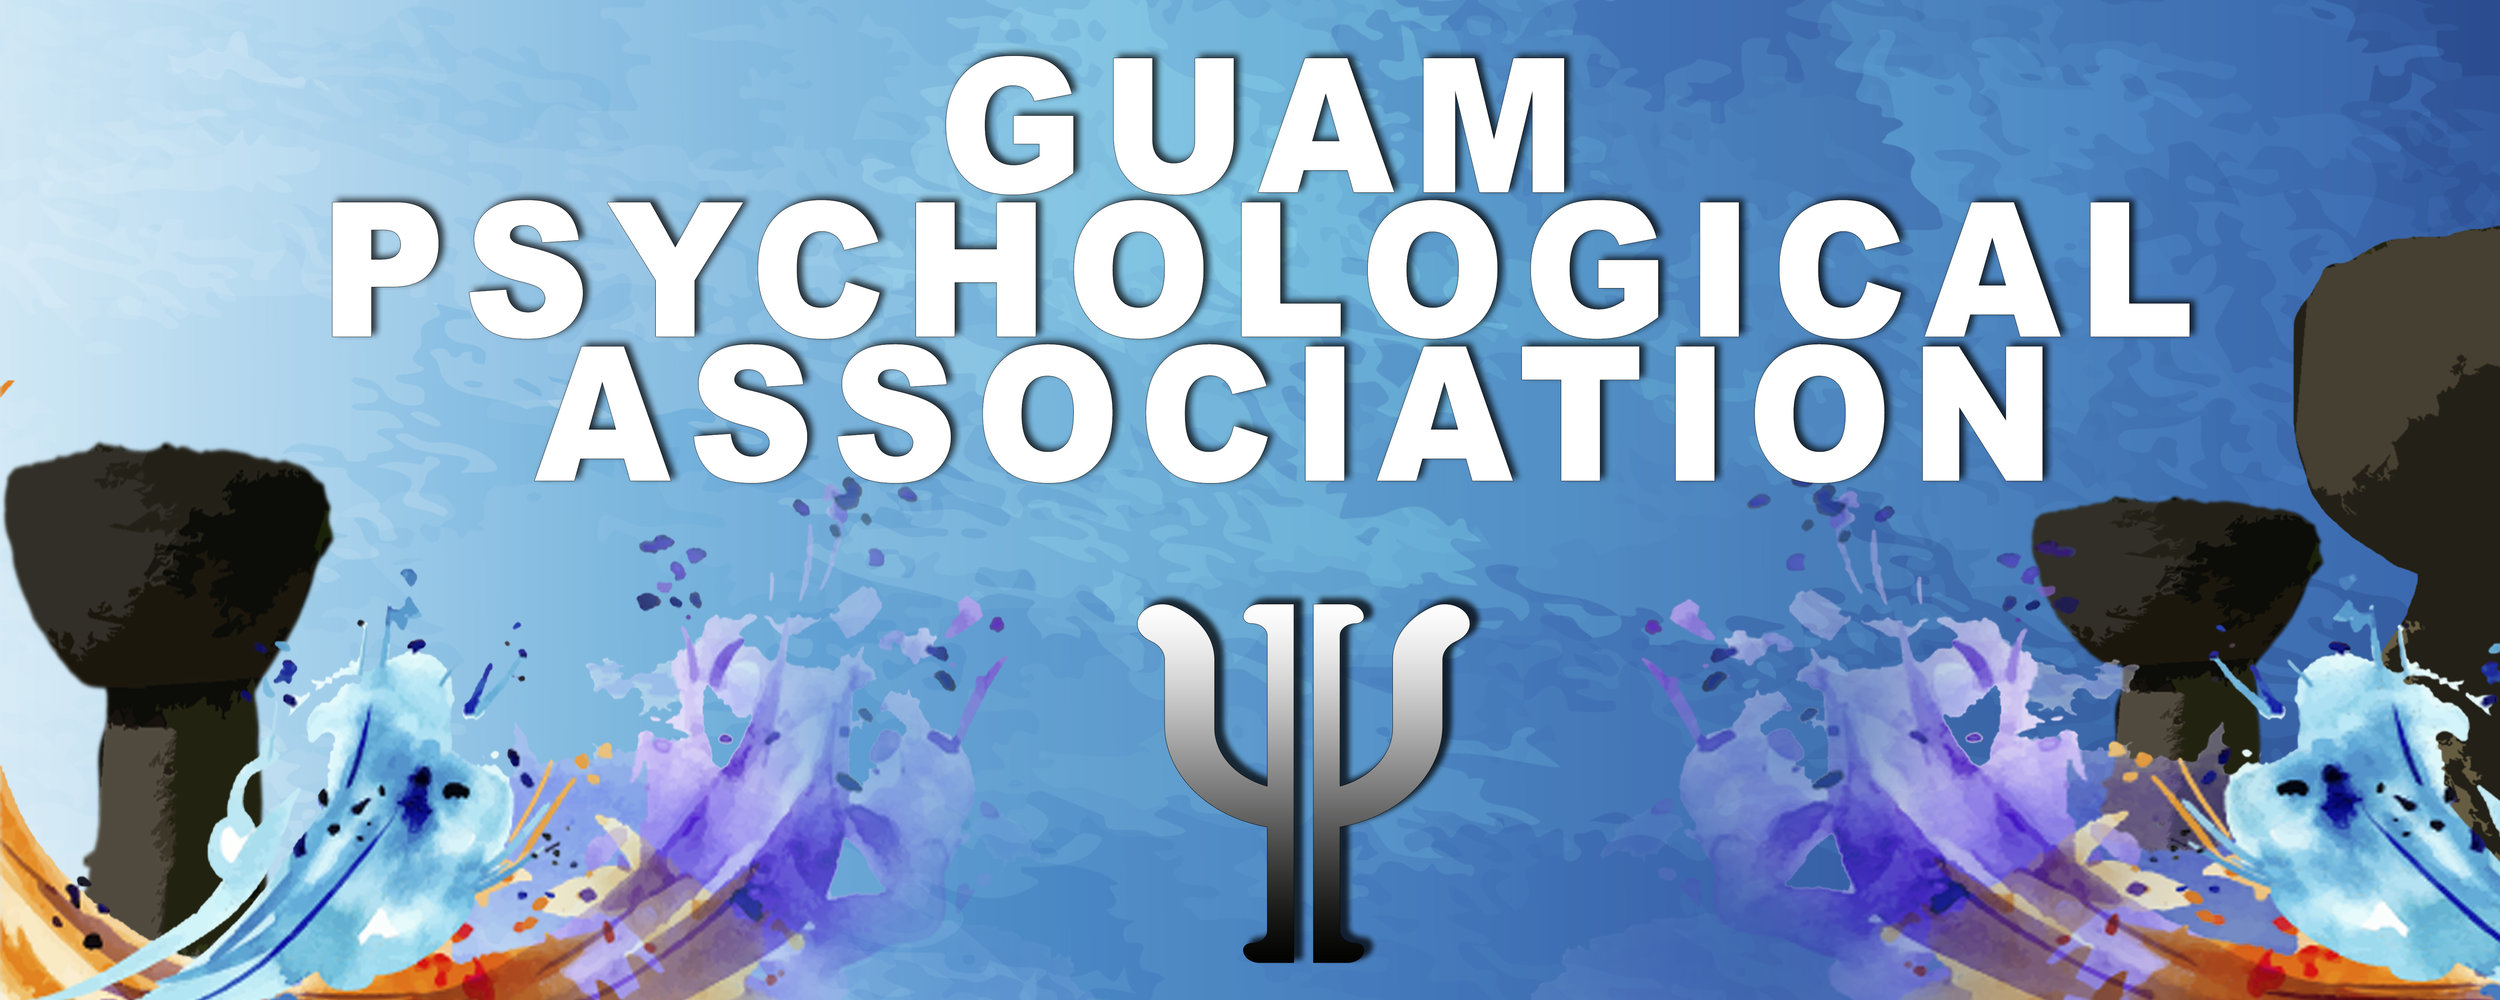 GUAM PSYCHOLOGICAL ASSOCIATION